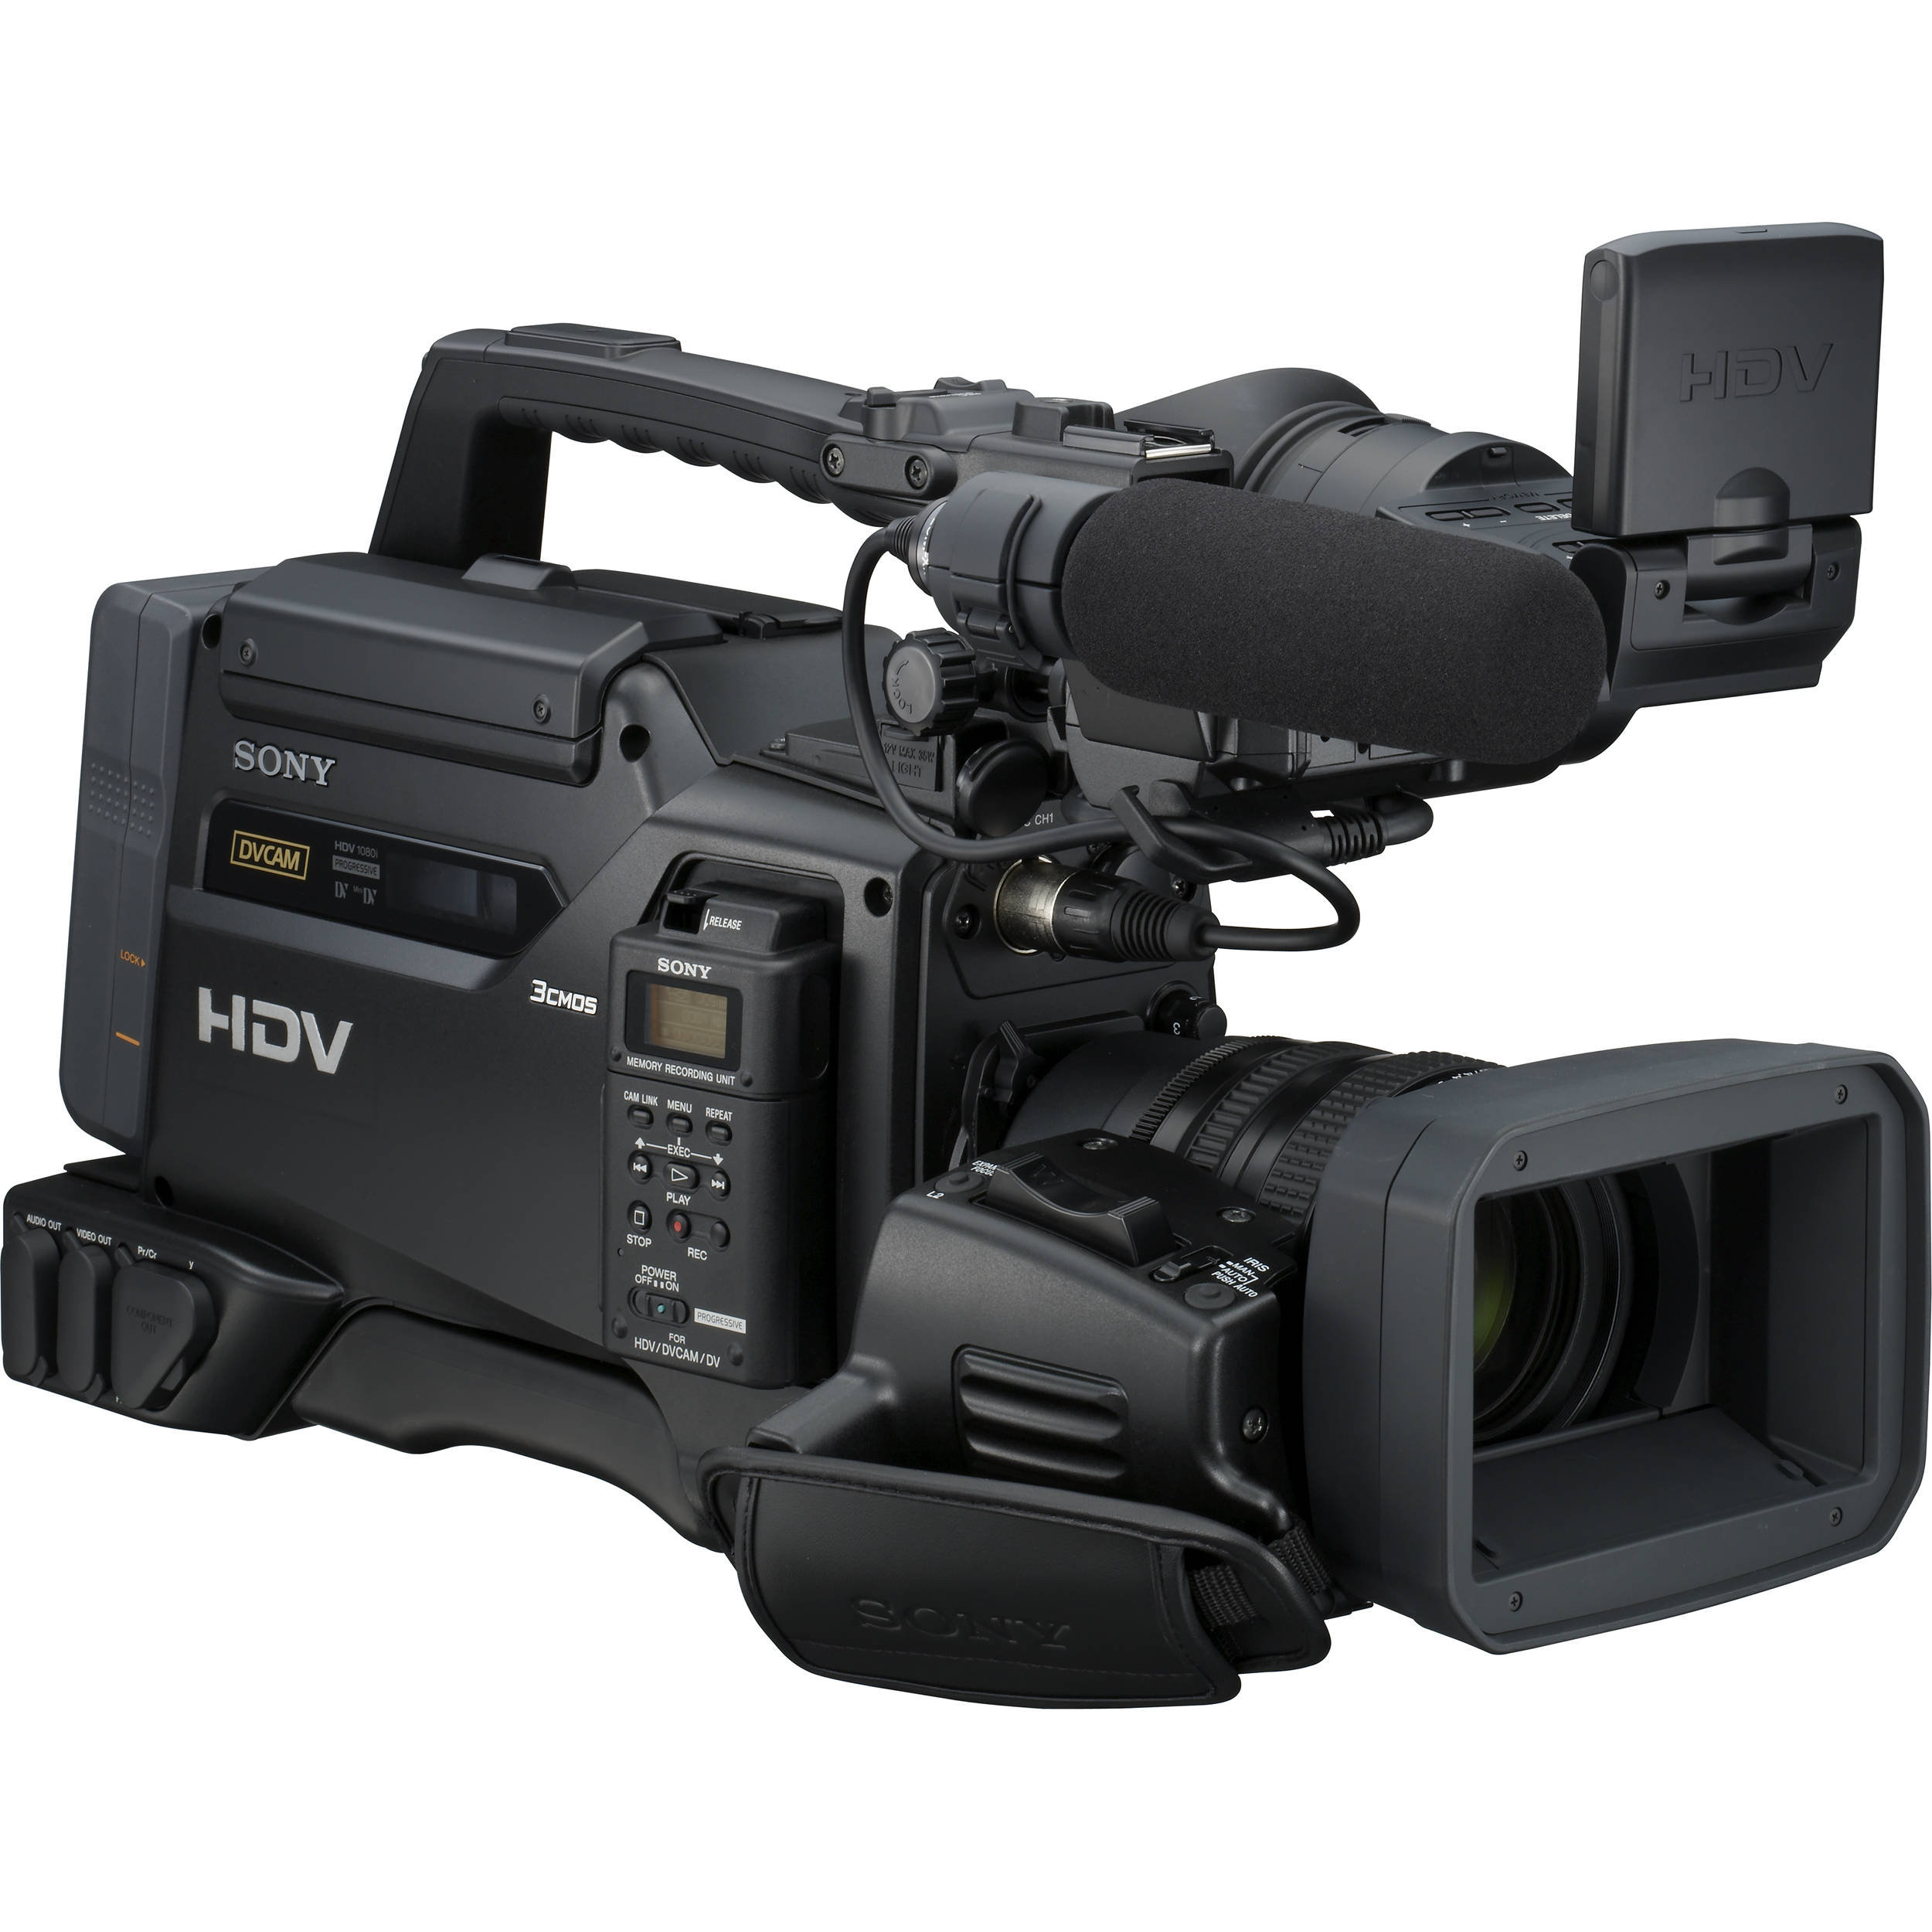 sony hvr s270u 1080i hdv camcorder hvr s270u b h photo video rh bhphotovideo com Sony Digital Camcorder Sony 1080I HD Progressive